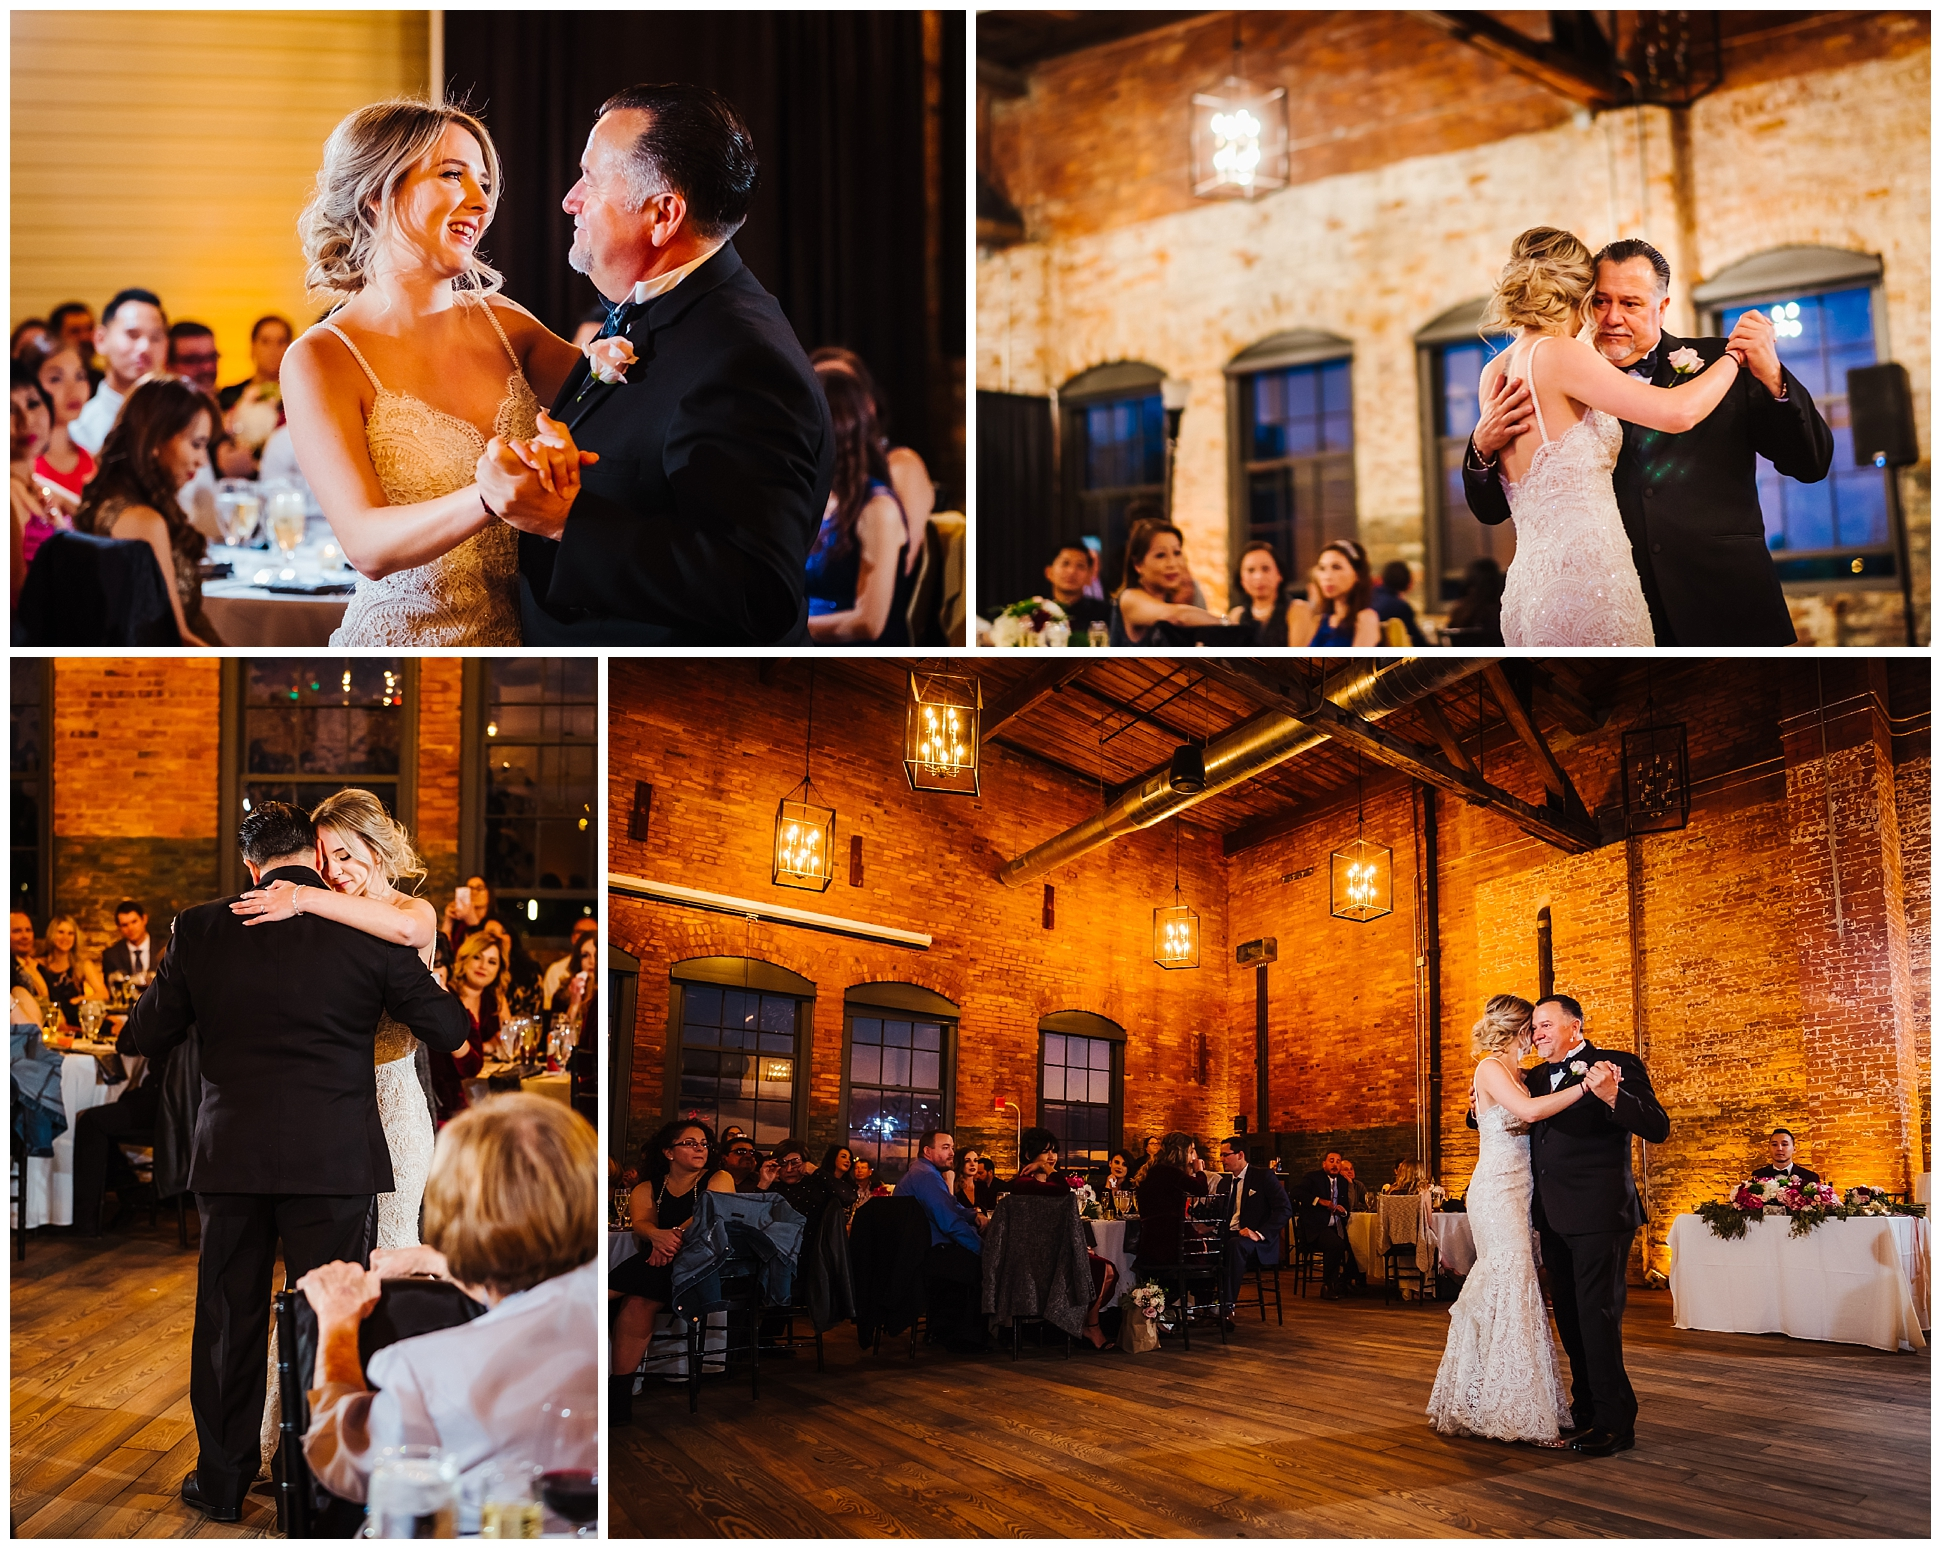 tampa-armeture-wedding-photographer-edgy-industrial-downtown-fancy-free-nursery-tattoo-burgandy-velvet_0073.jpg